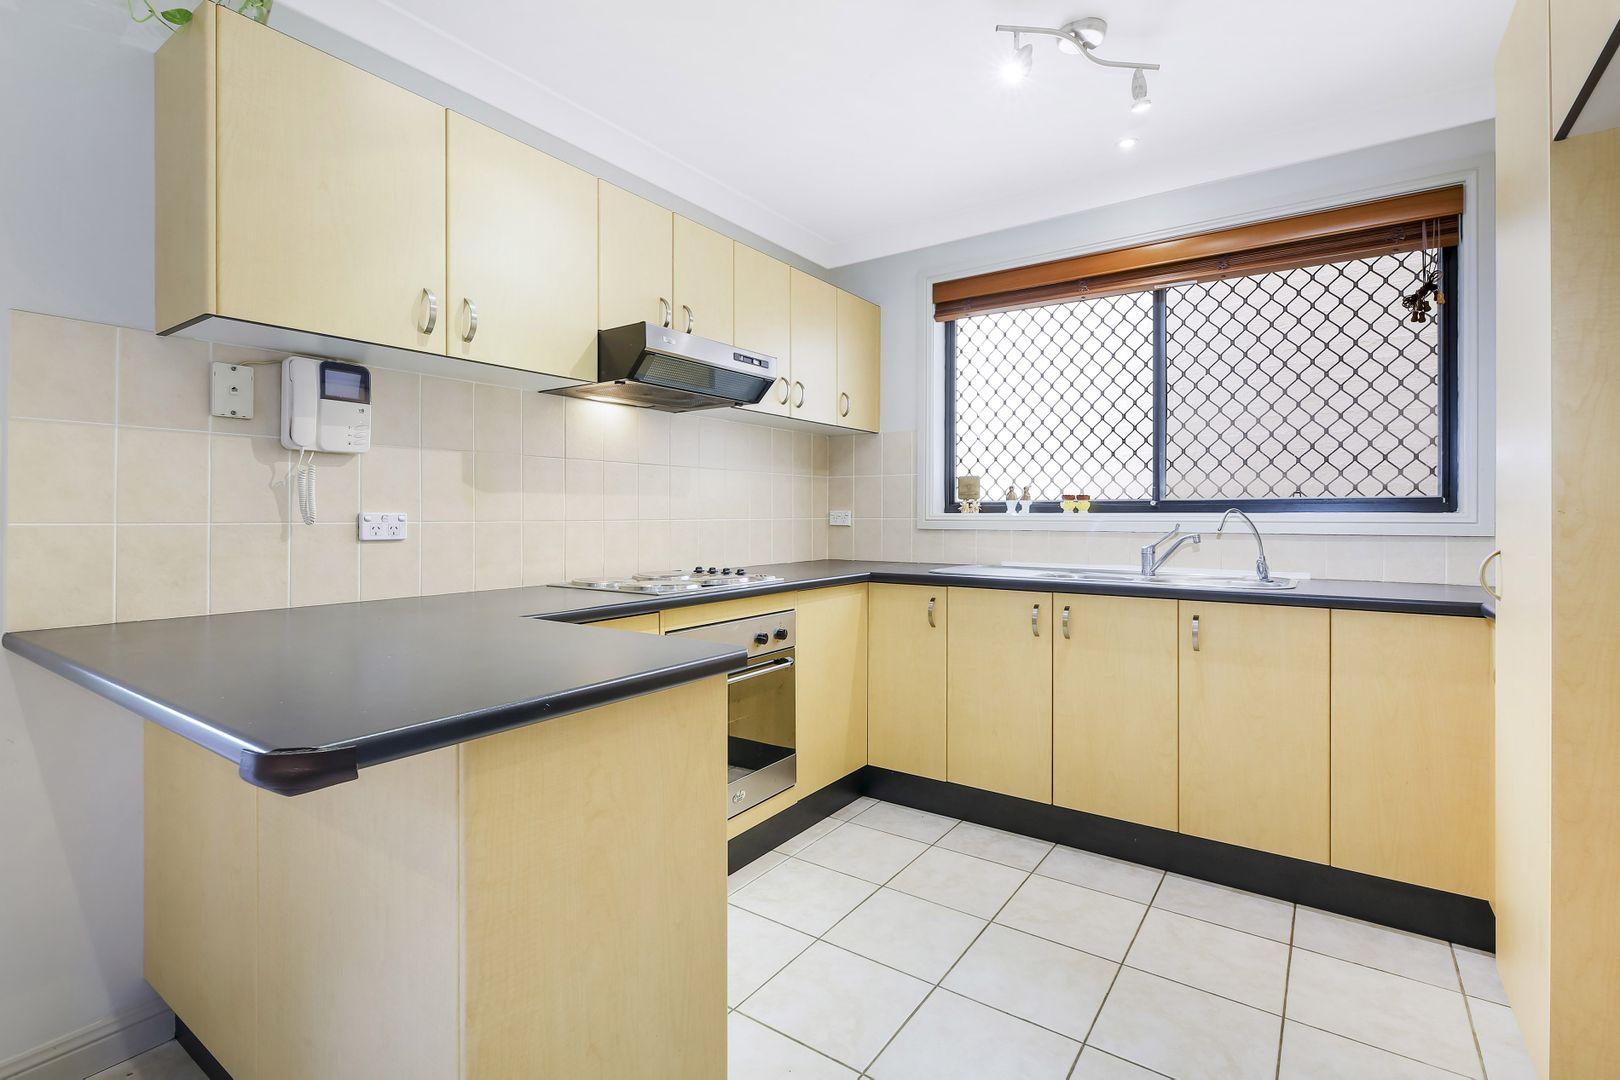 2/73 Buckingham Street, Canley Heights NSW 2166, Image 2